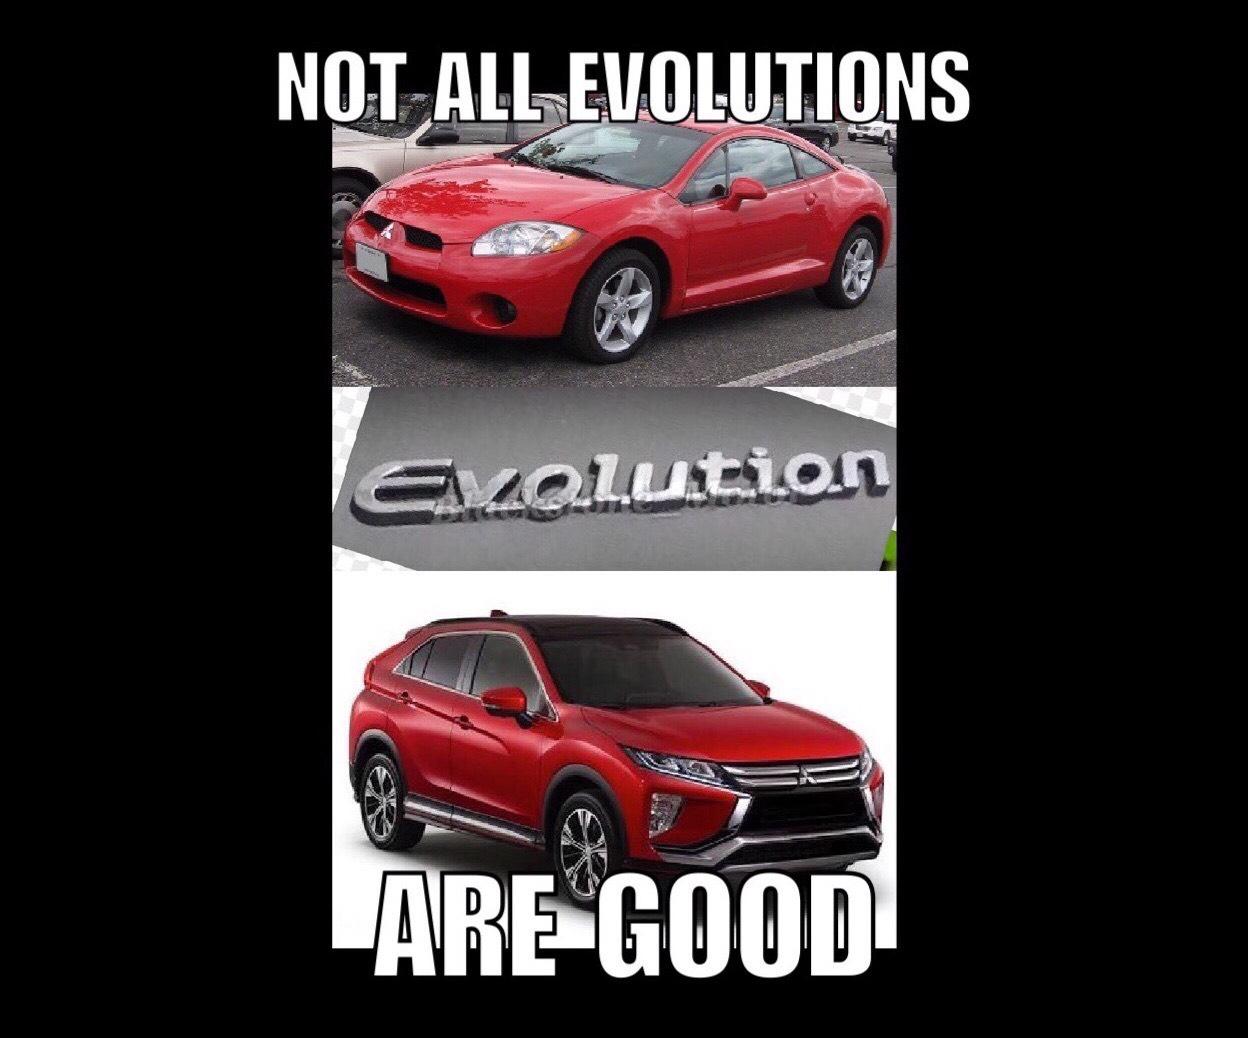 97e036cc68ba39c1ae99d7c497cb8ac7 mitsubishi meme no 3 evolution woes